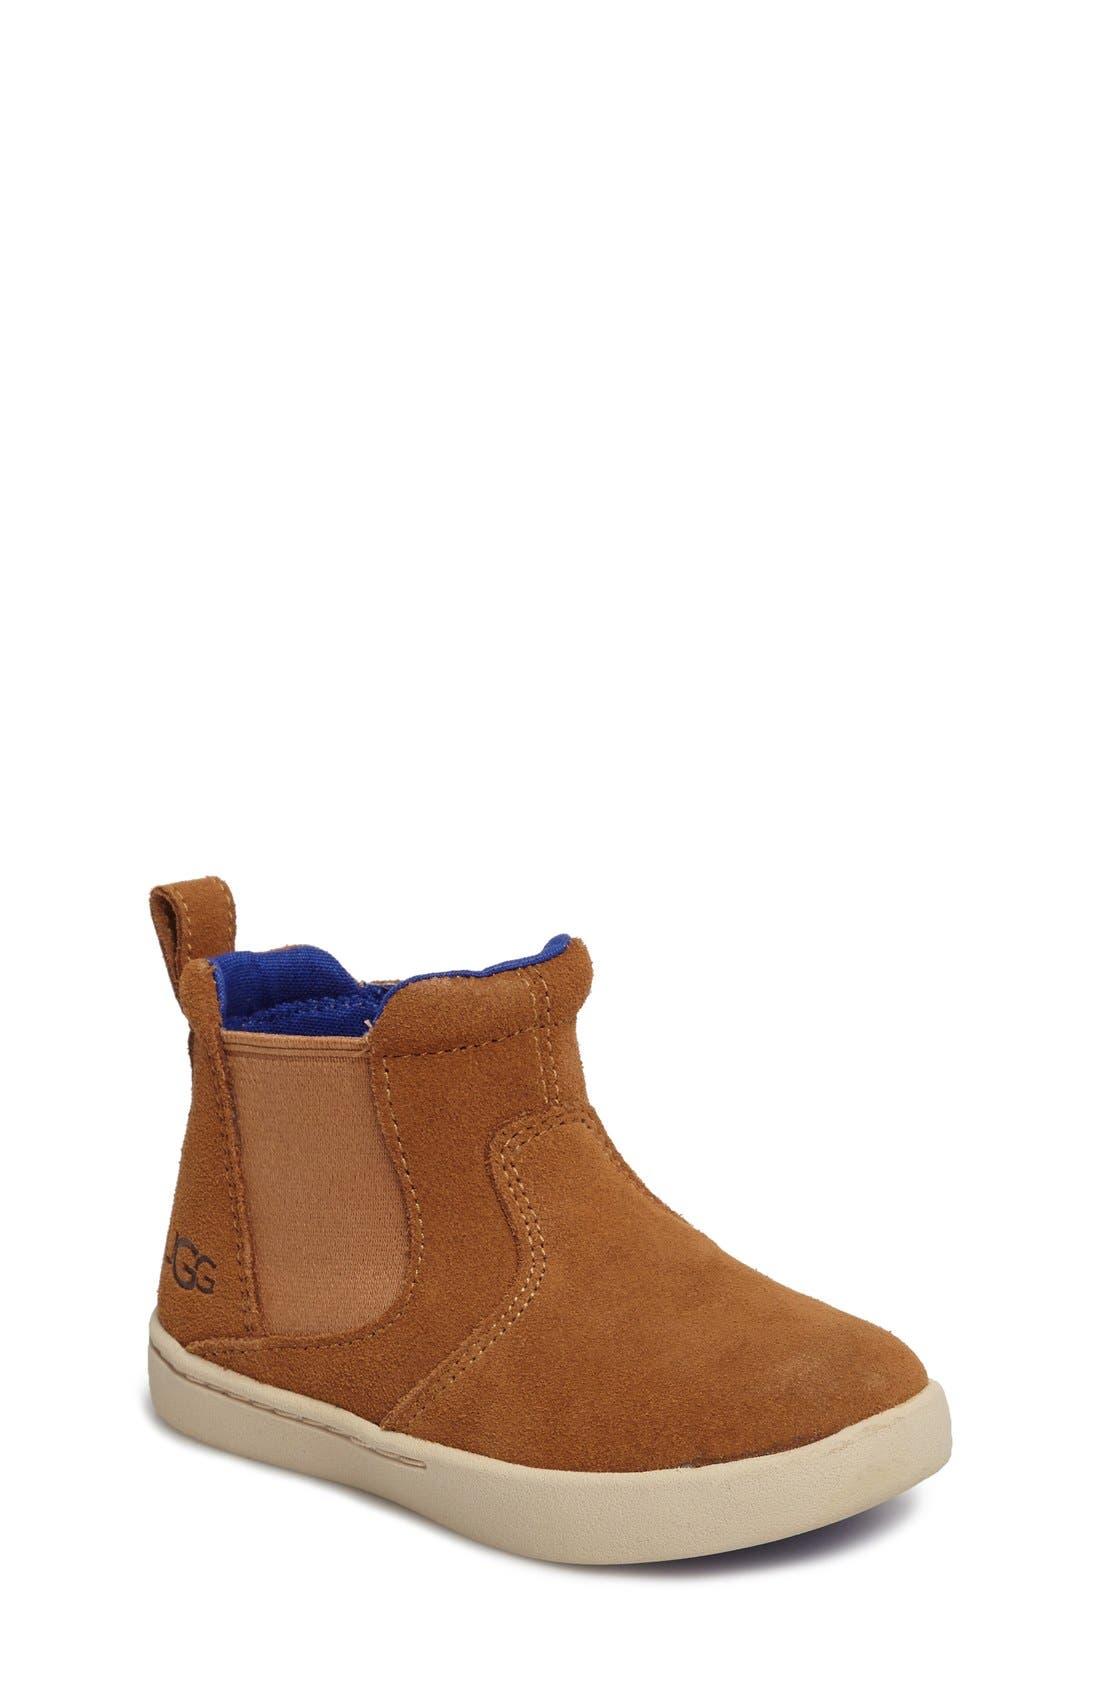 Main Image - UGG® Hamden Sneaker (Walker, Toddler, Little Kid & Big Kid)